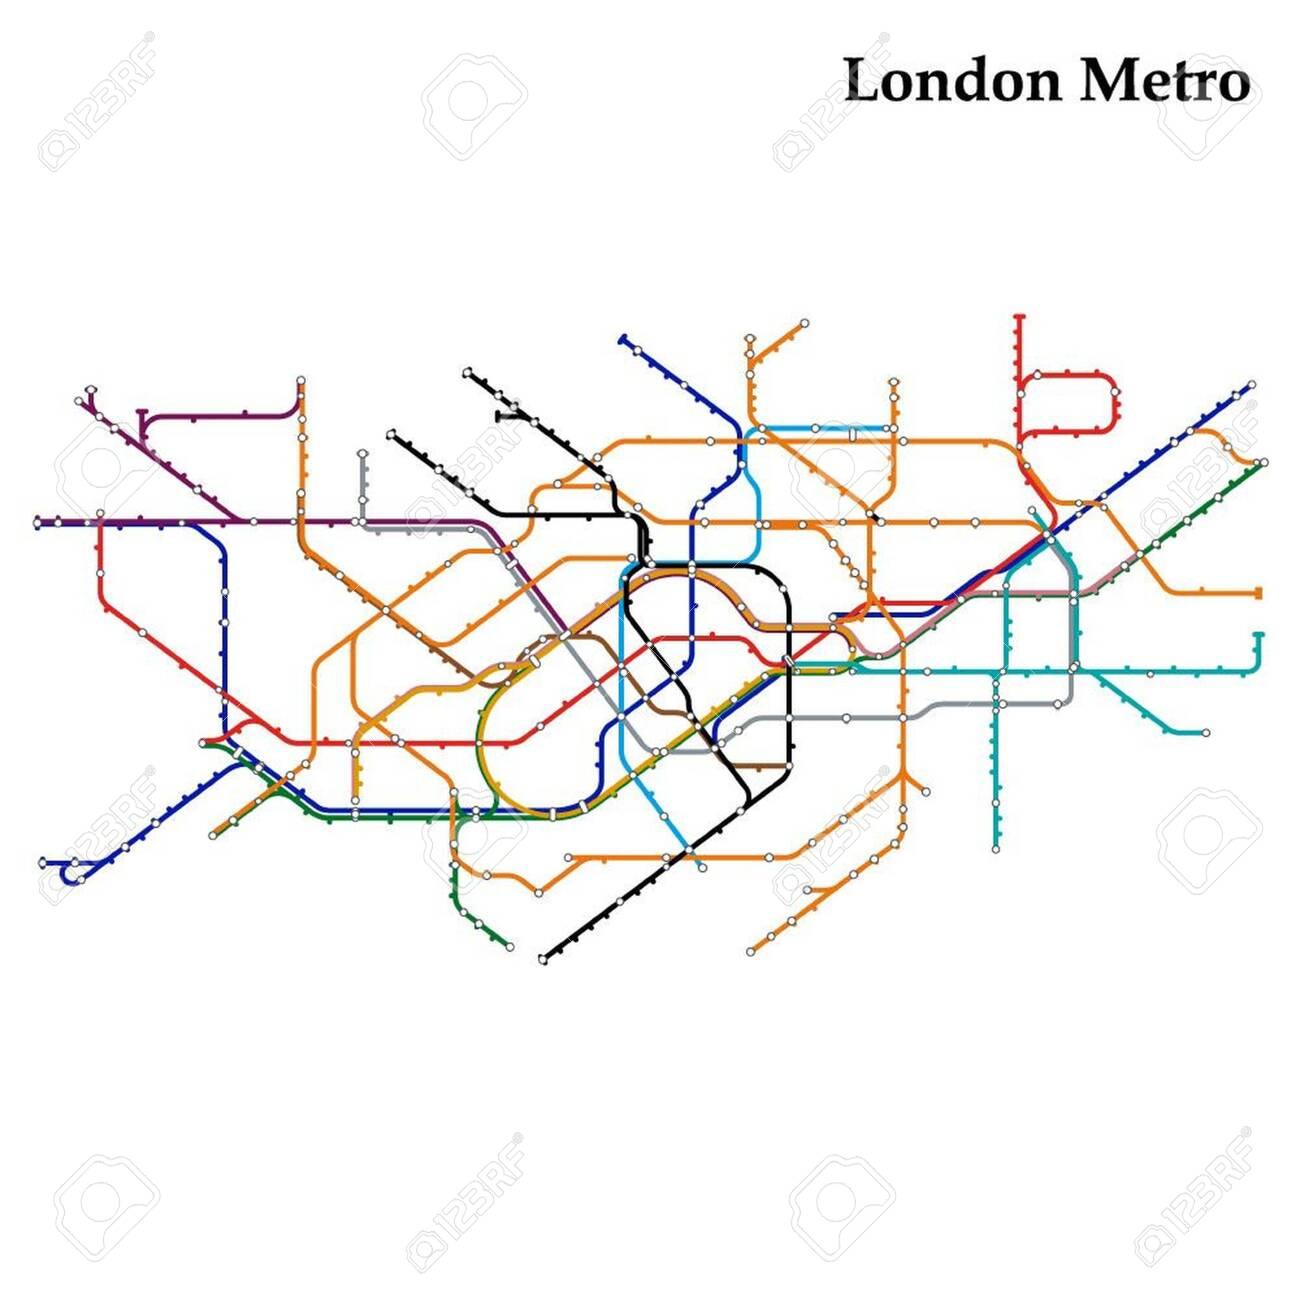 London England Transit Map.Map Of The London Metro Subway Template Of City Transportation